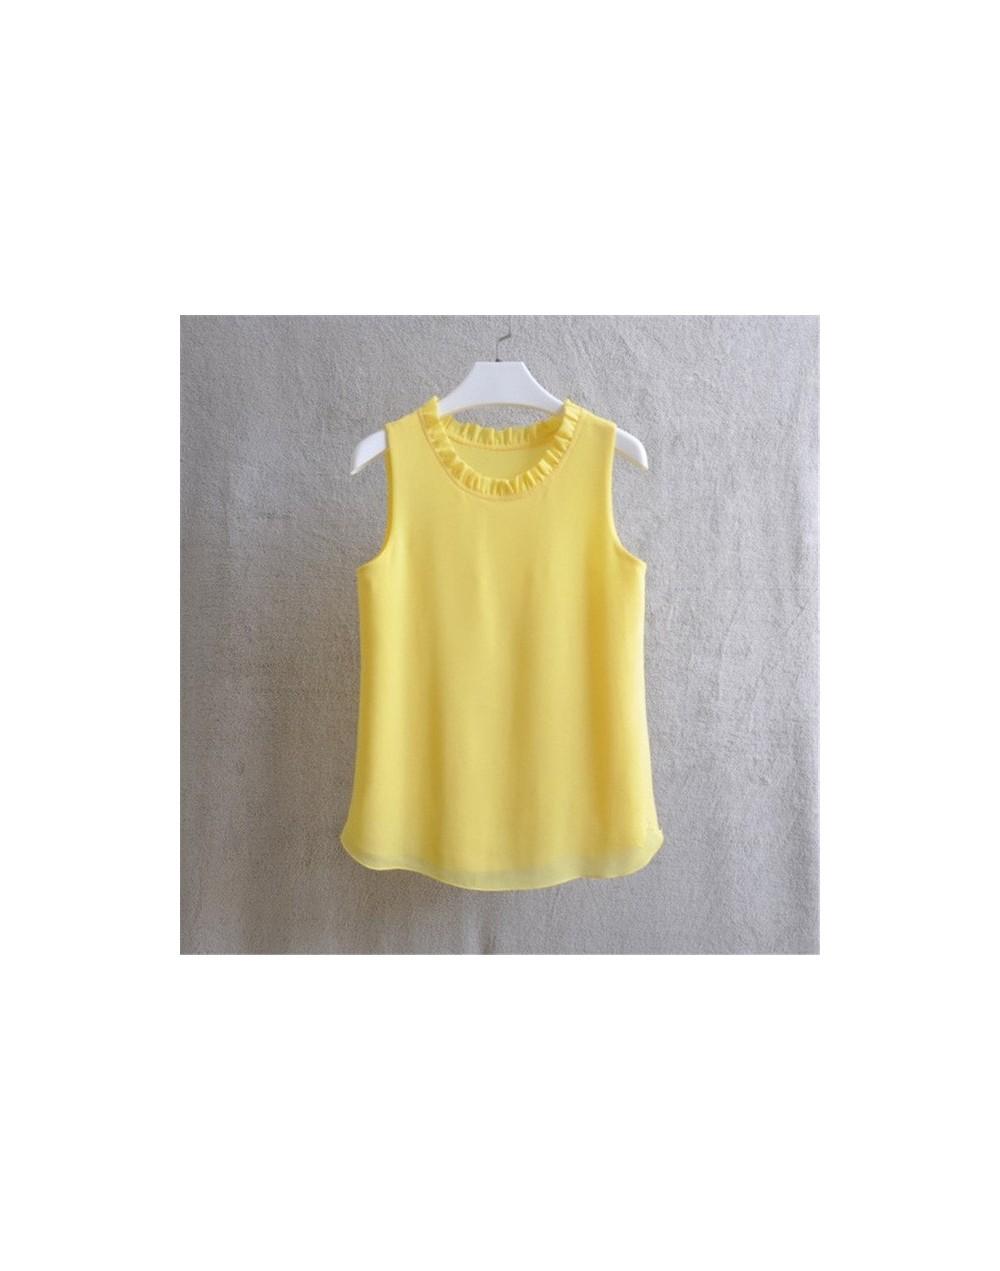 21 Colors Solid Ruffle Chiffon Blouse Women 2019 Summer Fashion Vest Blusas Casual Loose Sleeveless Ladies Tops Shirt - 4198...